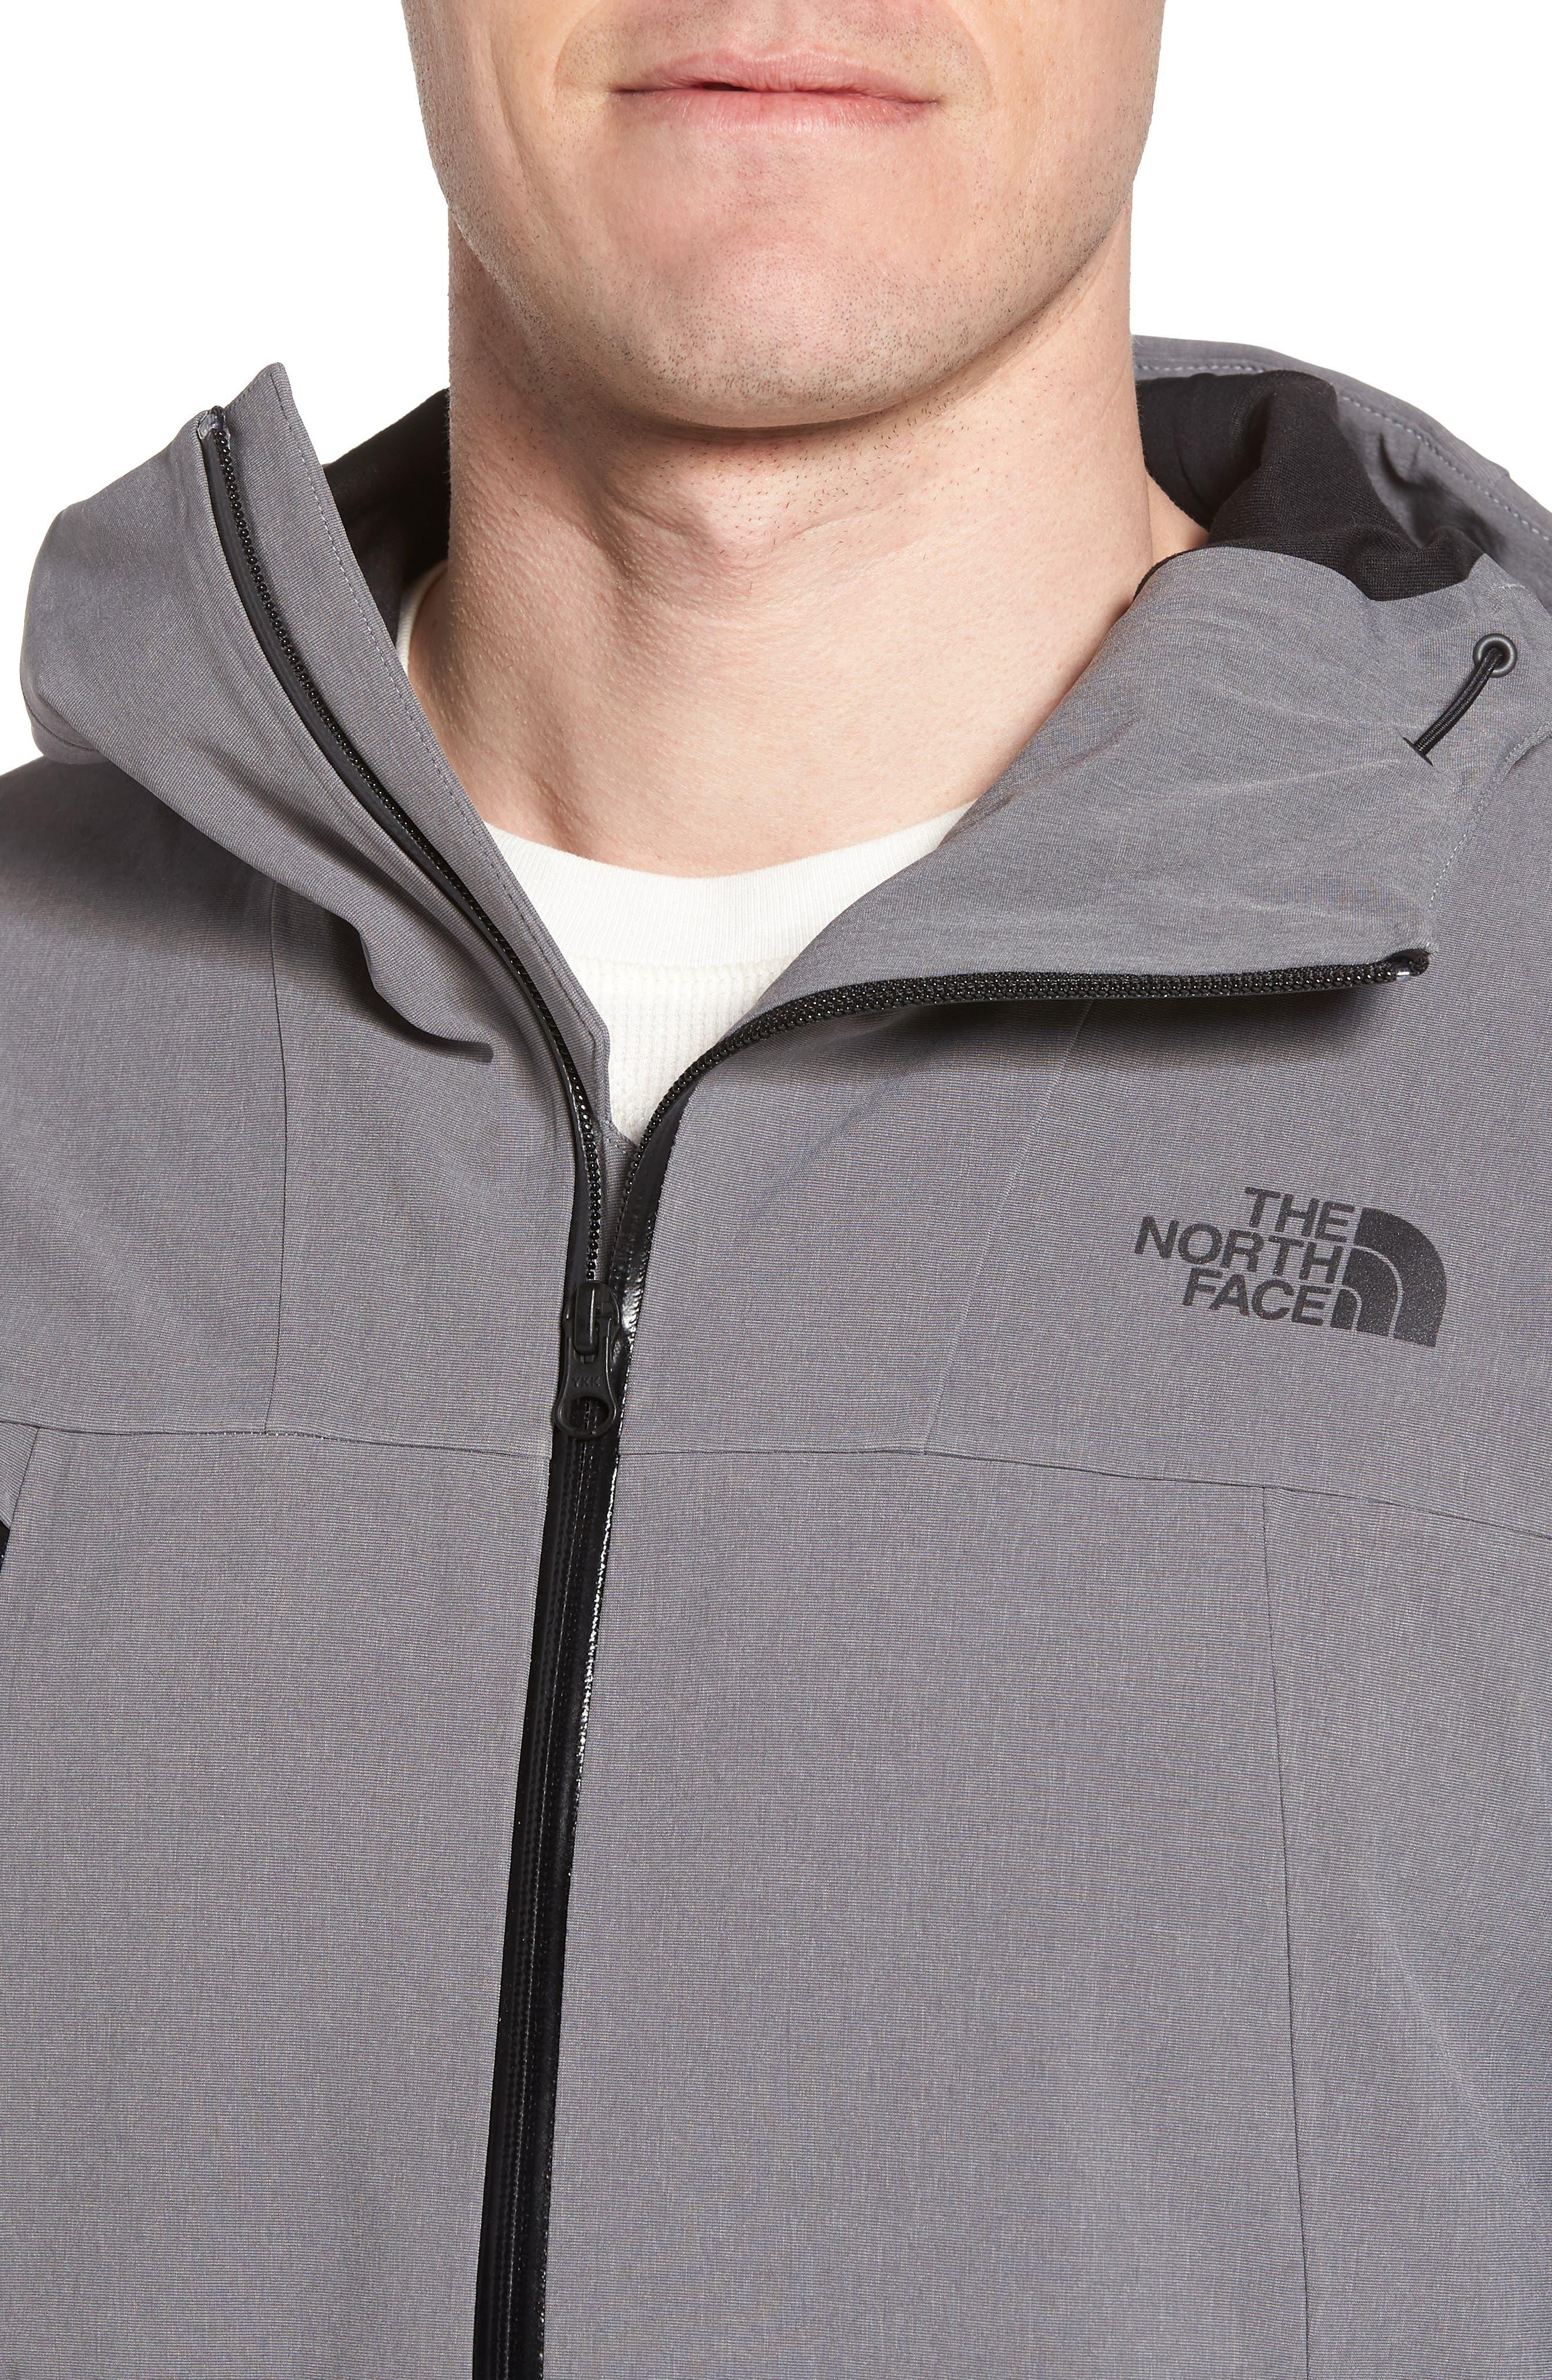 Apex Flex Gore-Tex<sup>®</sup> Waterproof Jacket,                             Alternate thumbnail 4, color,                             Medium Grey Heather